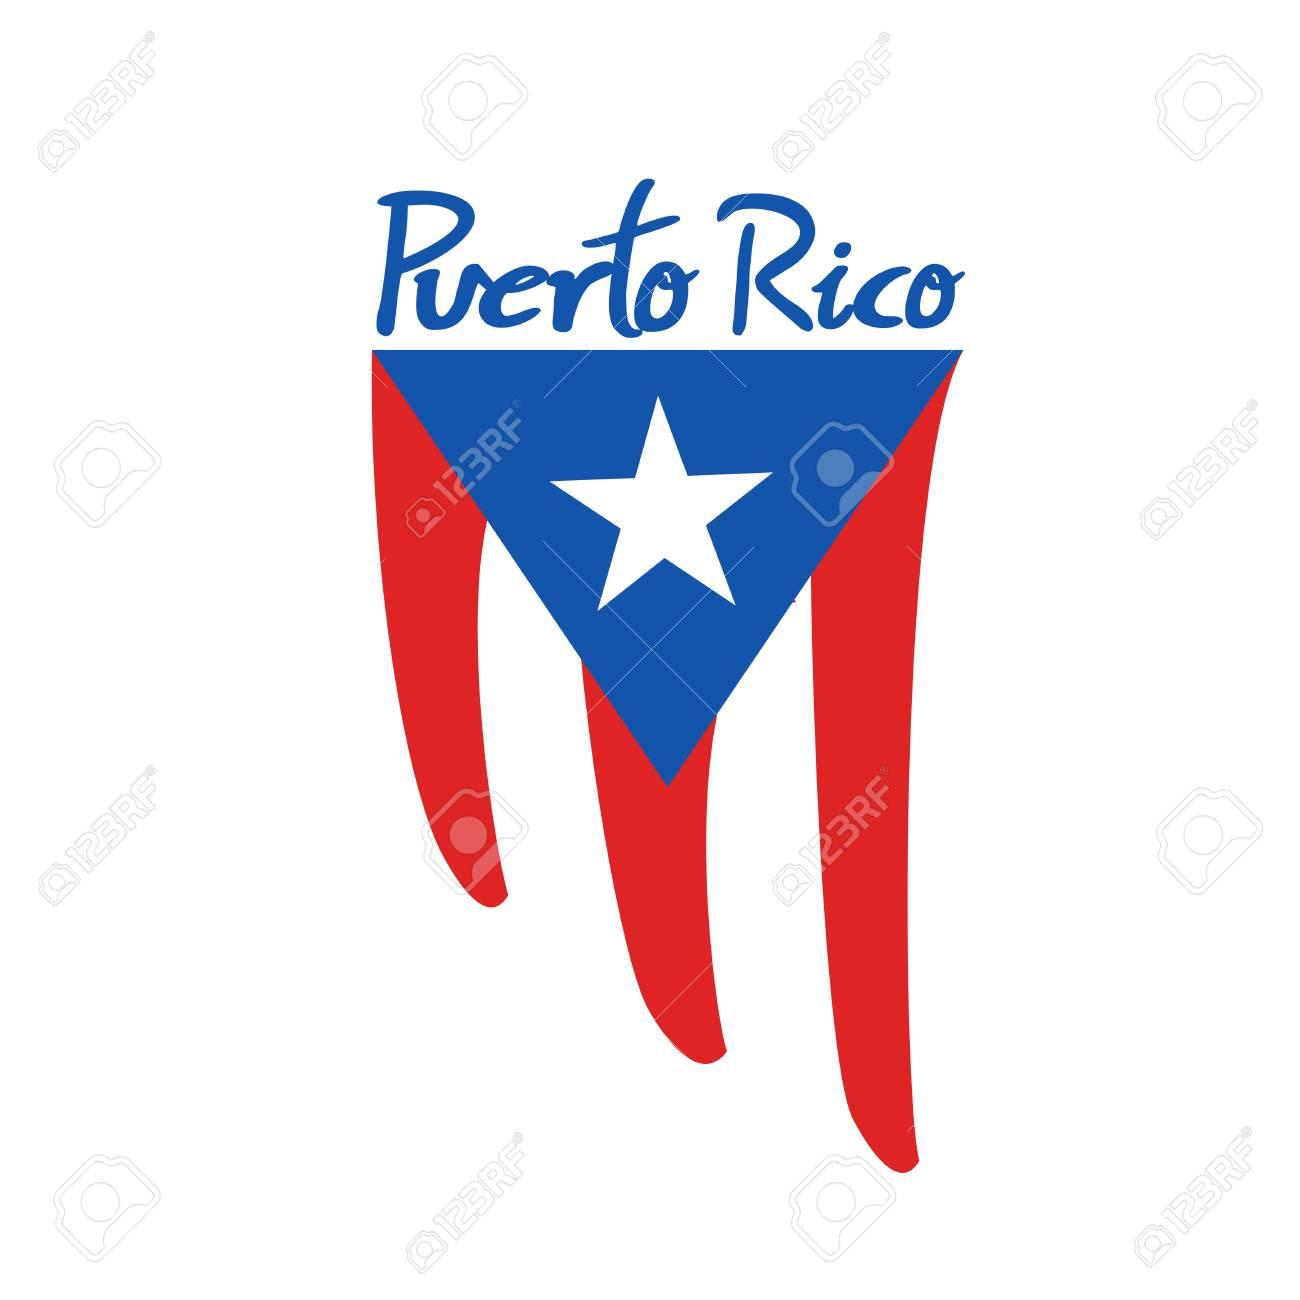 Puerto Rico Flag Symbol Royalty Free Cliparts, Vectors, And Stock  Illustration. Image 102382697.